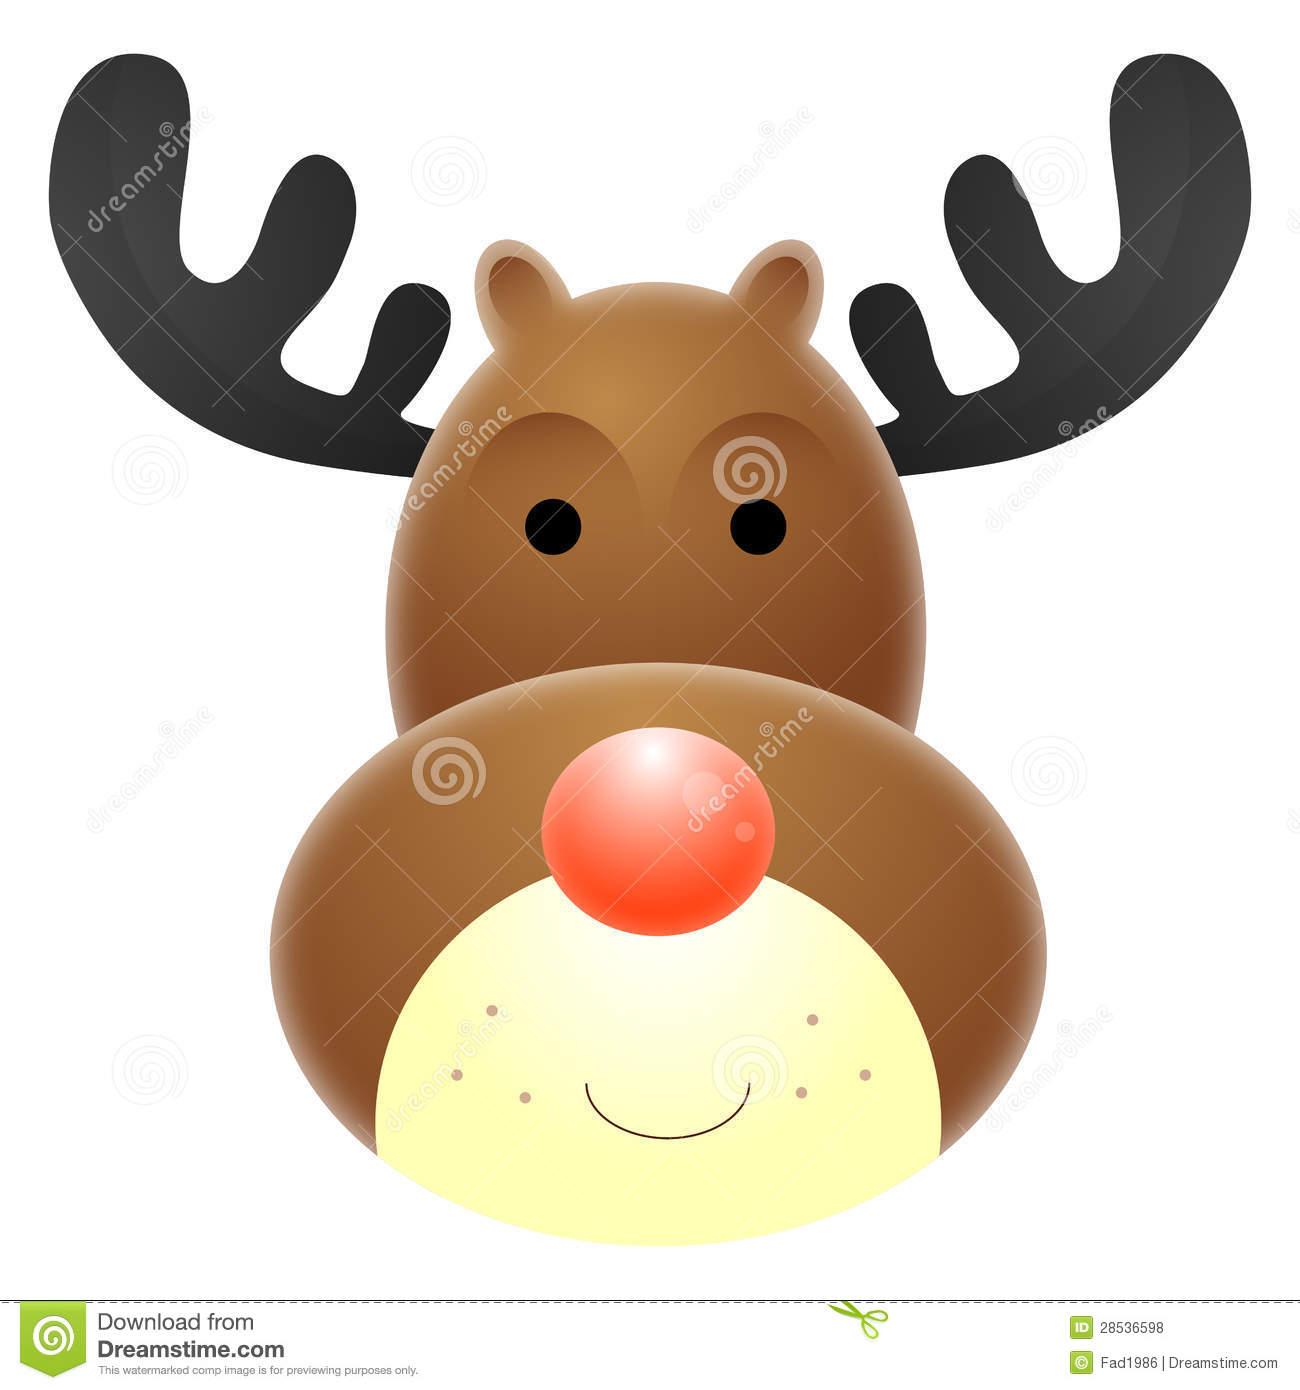 Rudolf The Rednosed Reindeer Clipart.